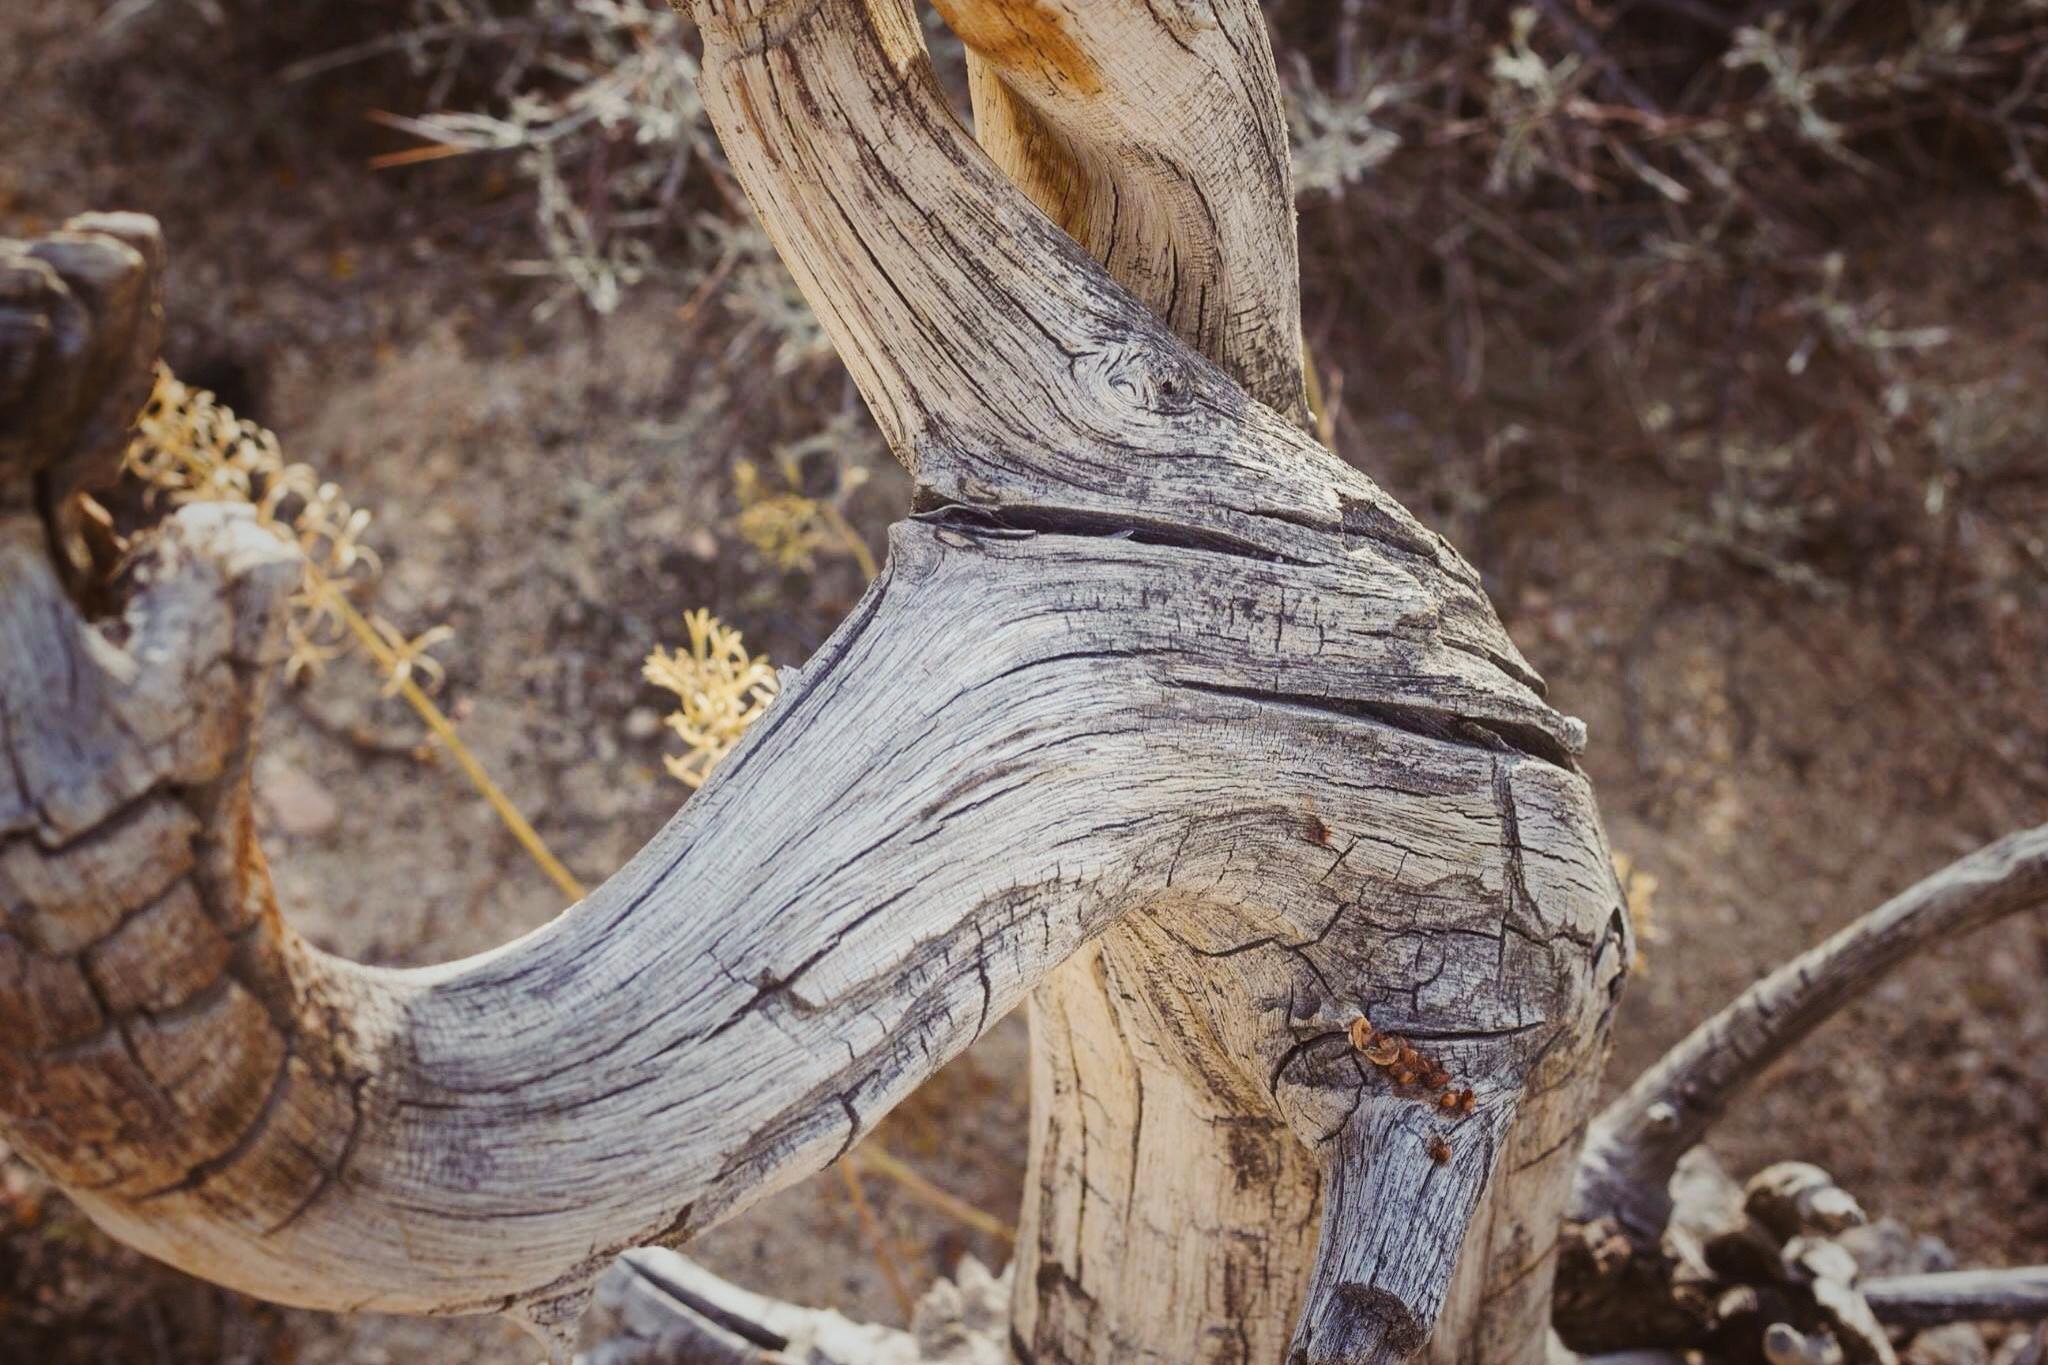 tree in desert encampement case of thenomads.jpg